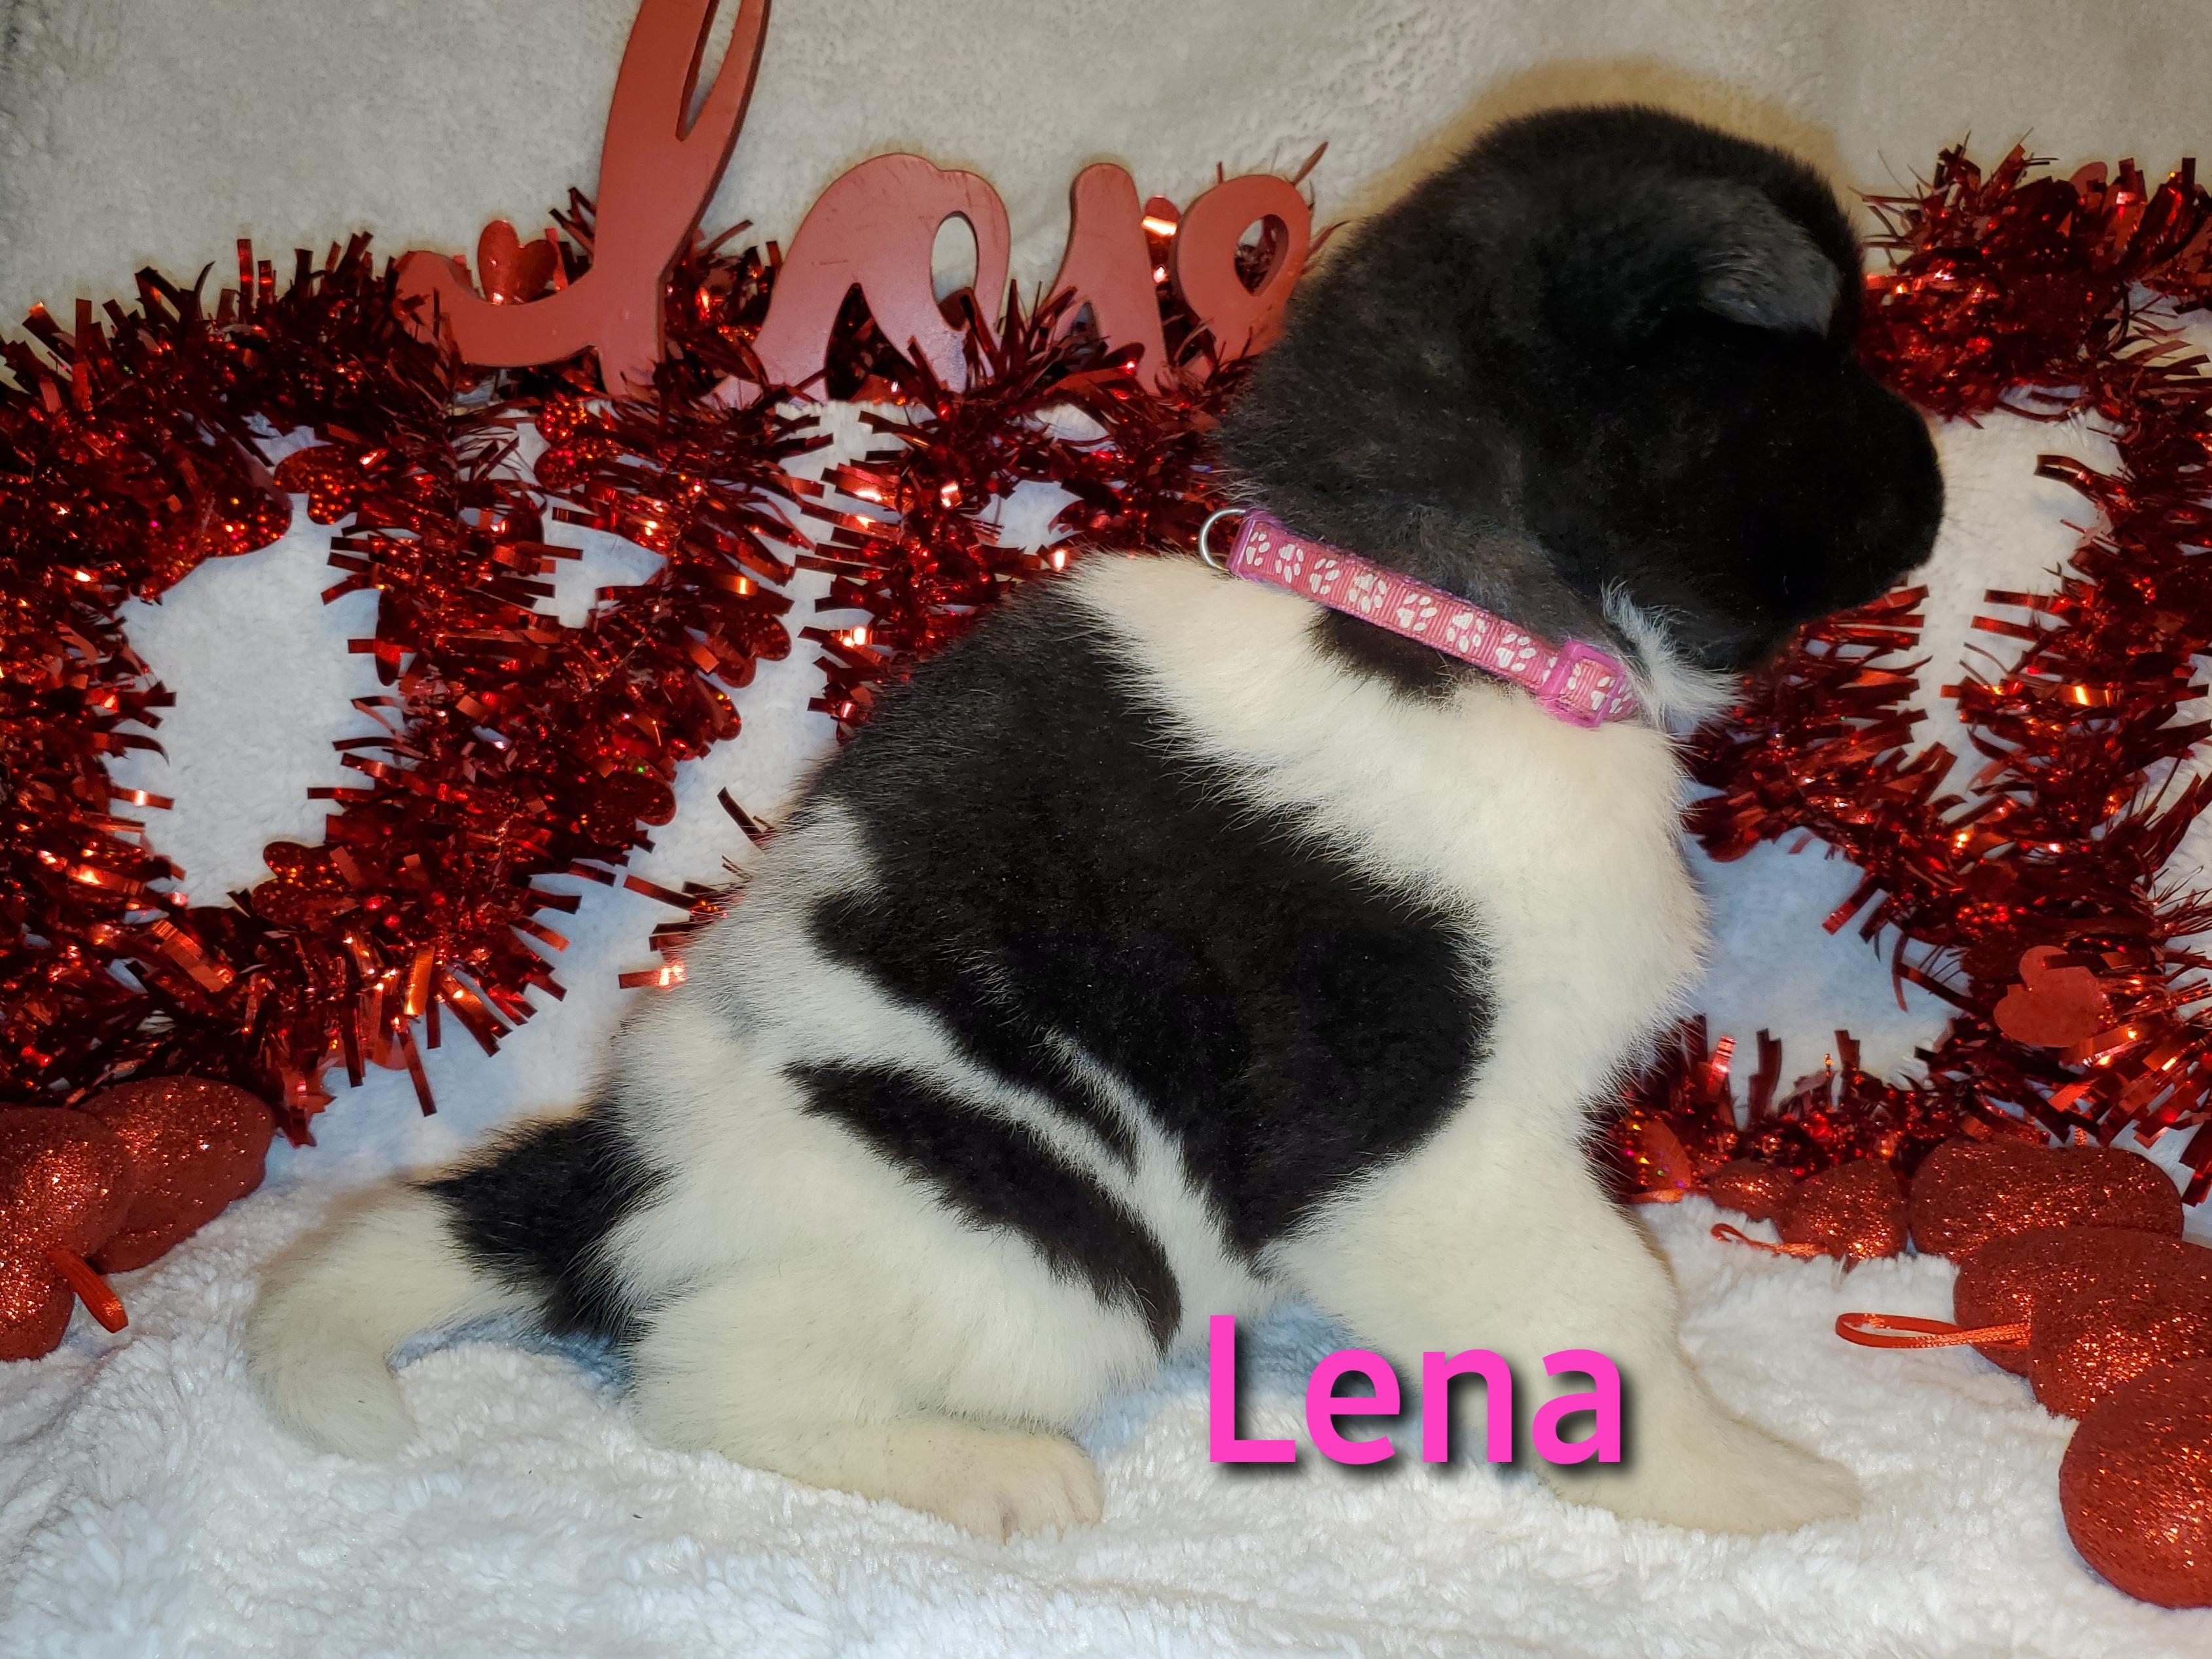 Lena right.jpg